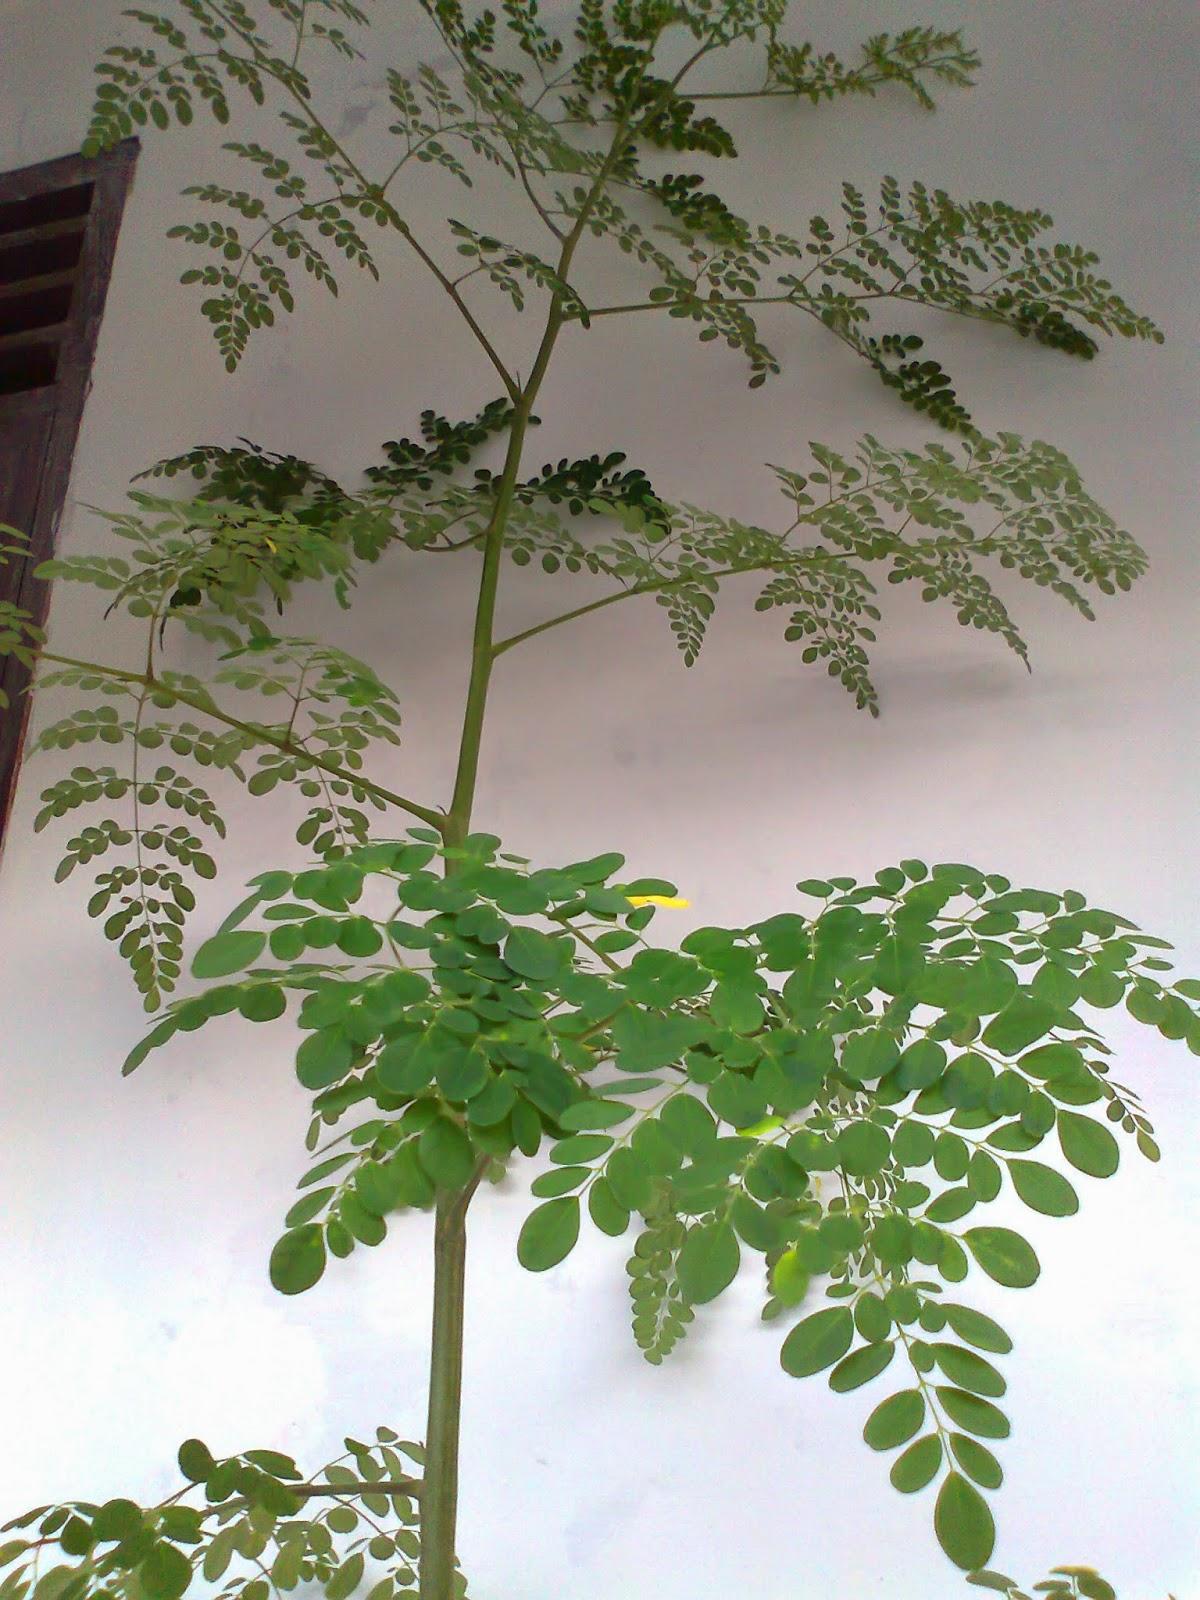 Batang Kelor Moringa Oleifera